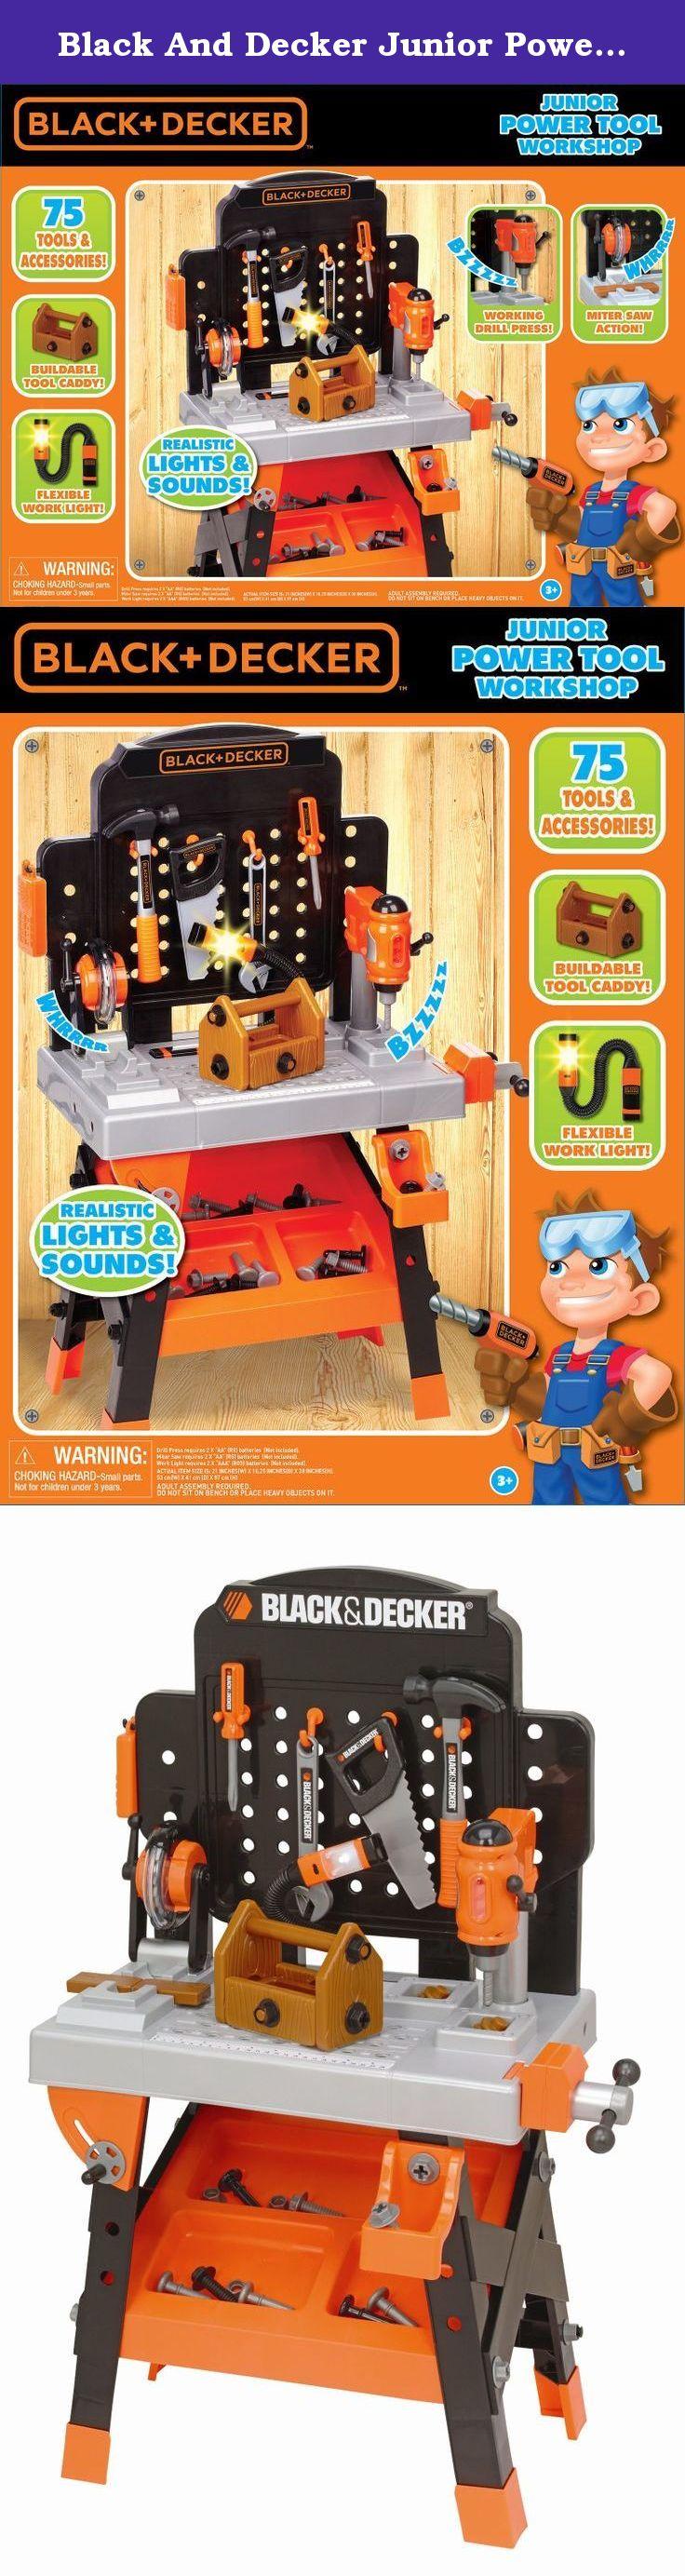 7dae4802f Black And Decker Junior Power Tool Workshop (Closed Box). Black and Decker  Junior